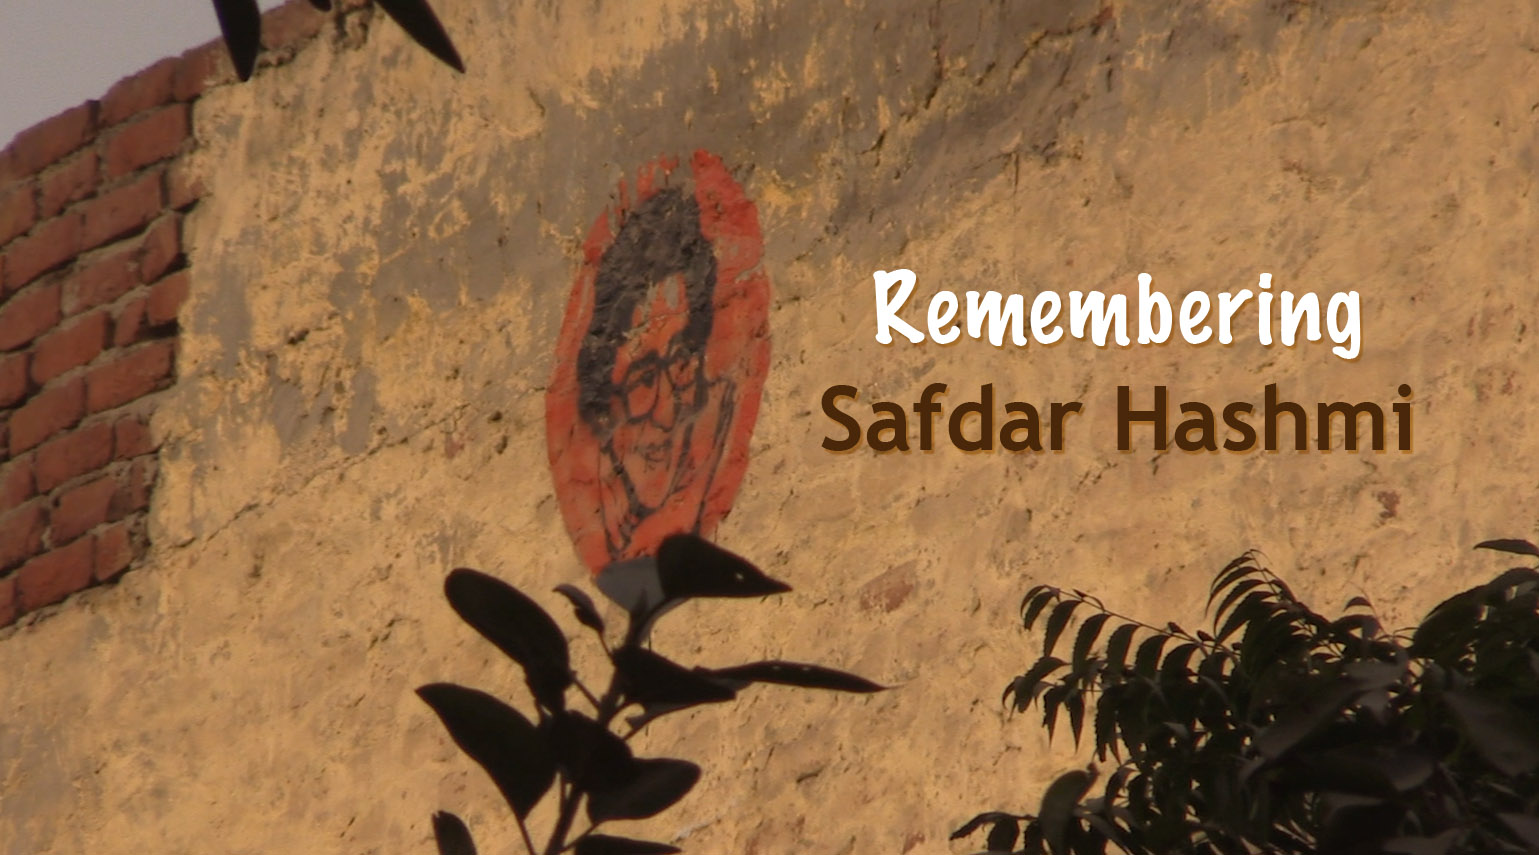 Remembering Safdar Hashmi (12 April 1954 – 2 January 1989)